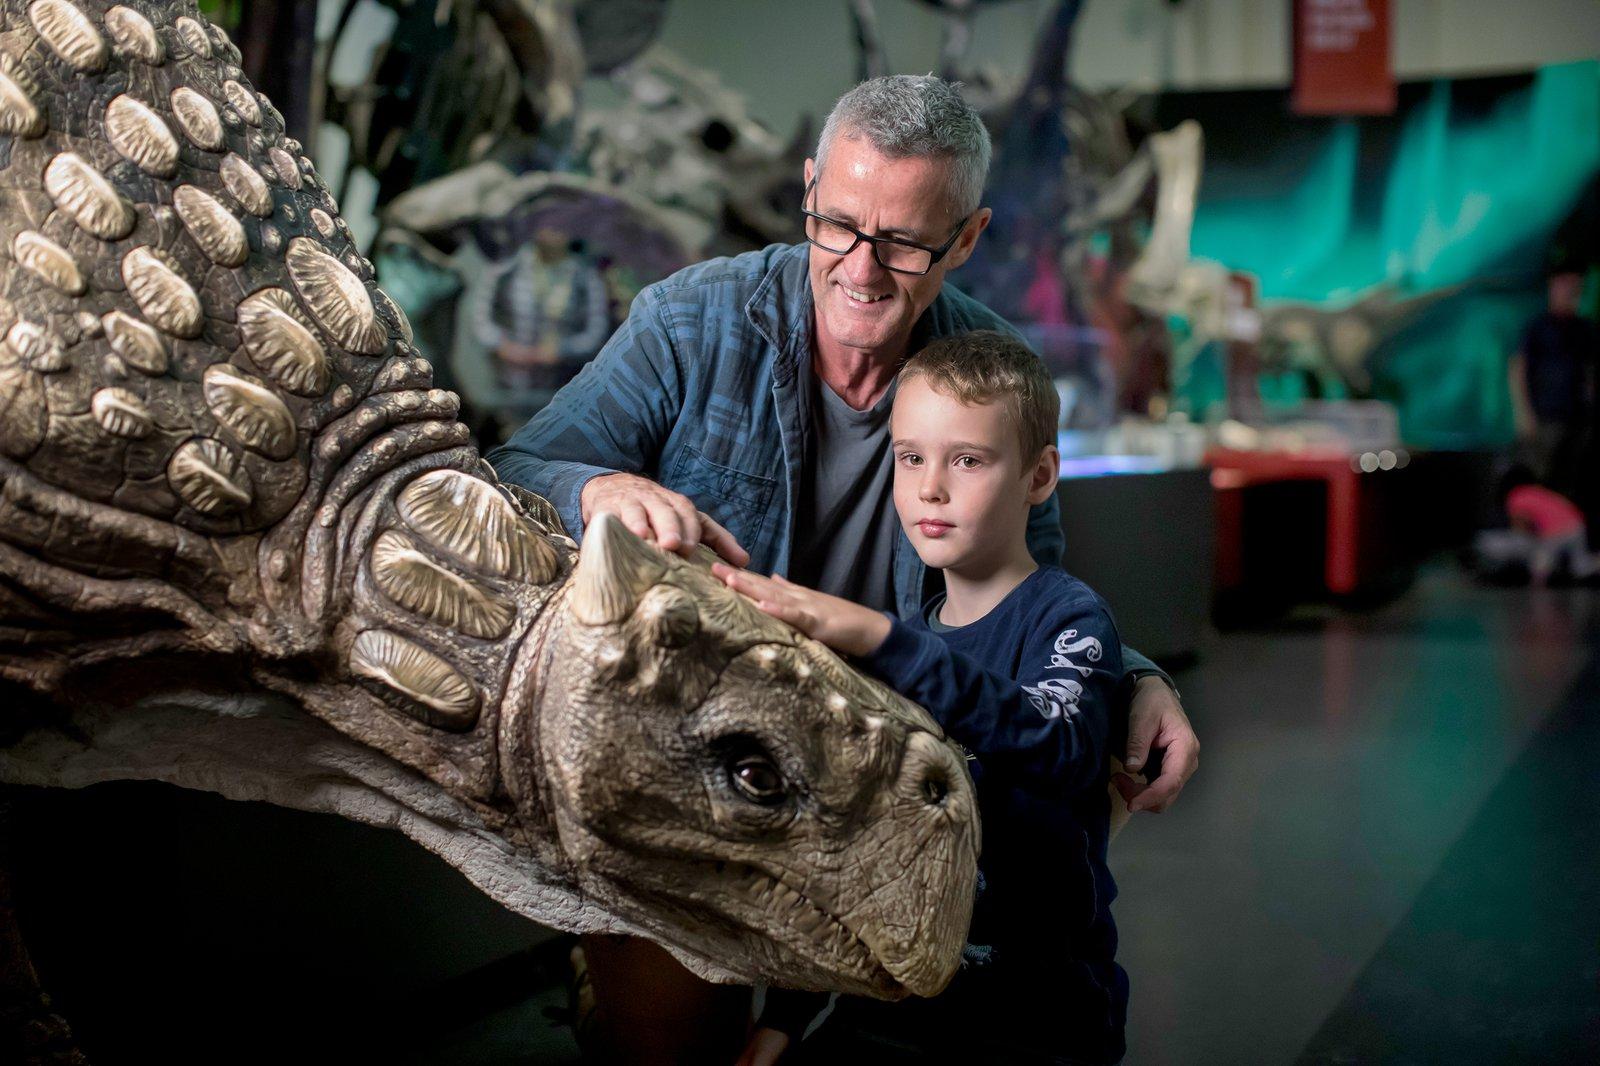 A family visiting Dinosaurs